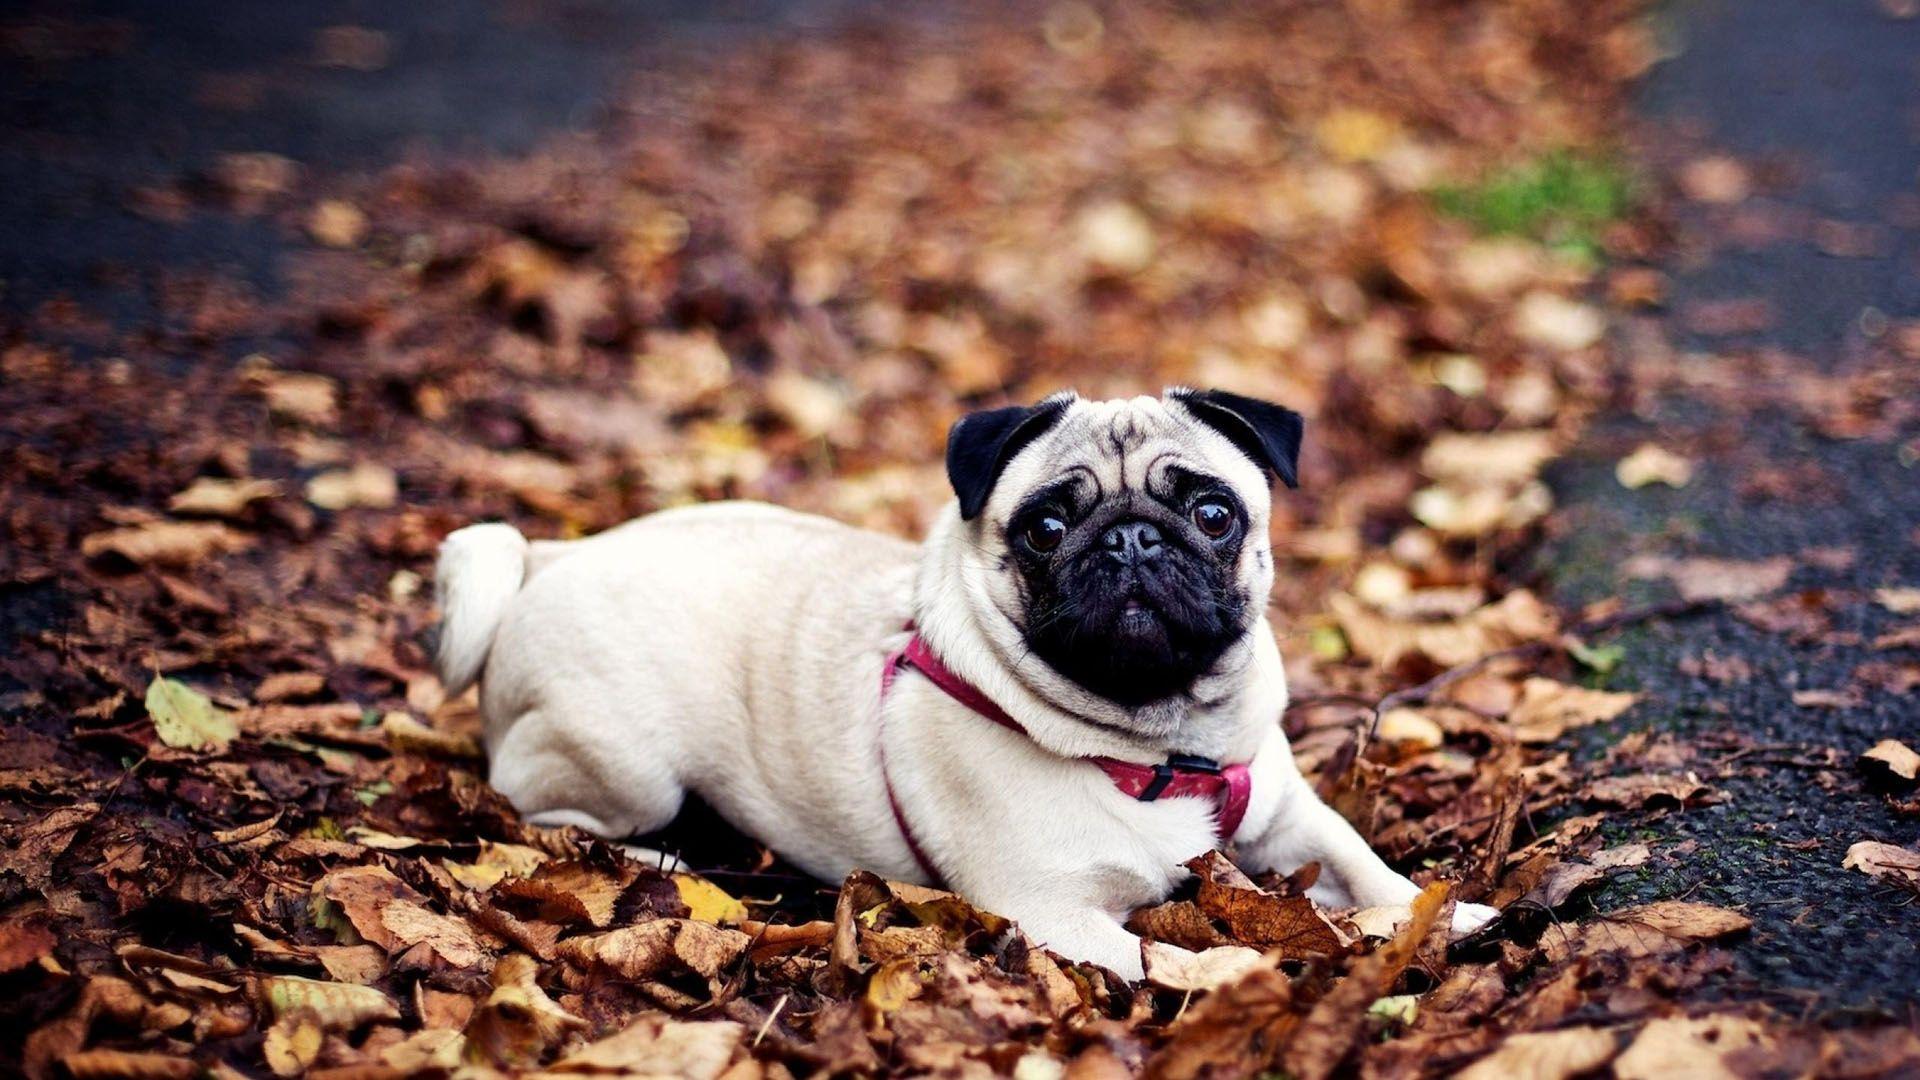 download pug dog hd desktop wallpapers new beautiful images 1920x1080